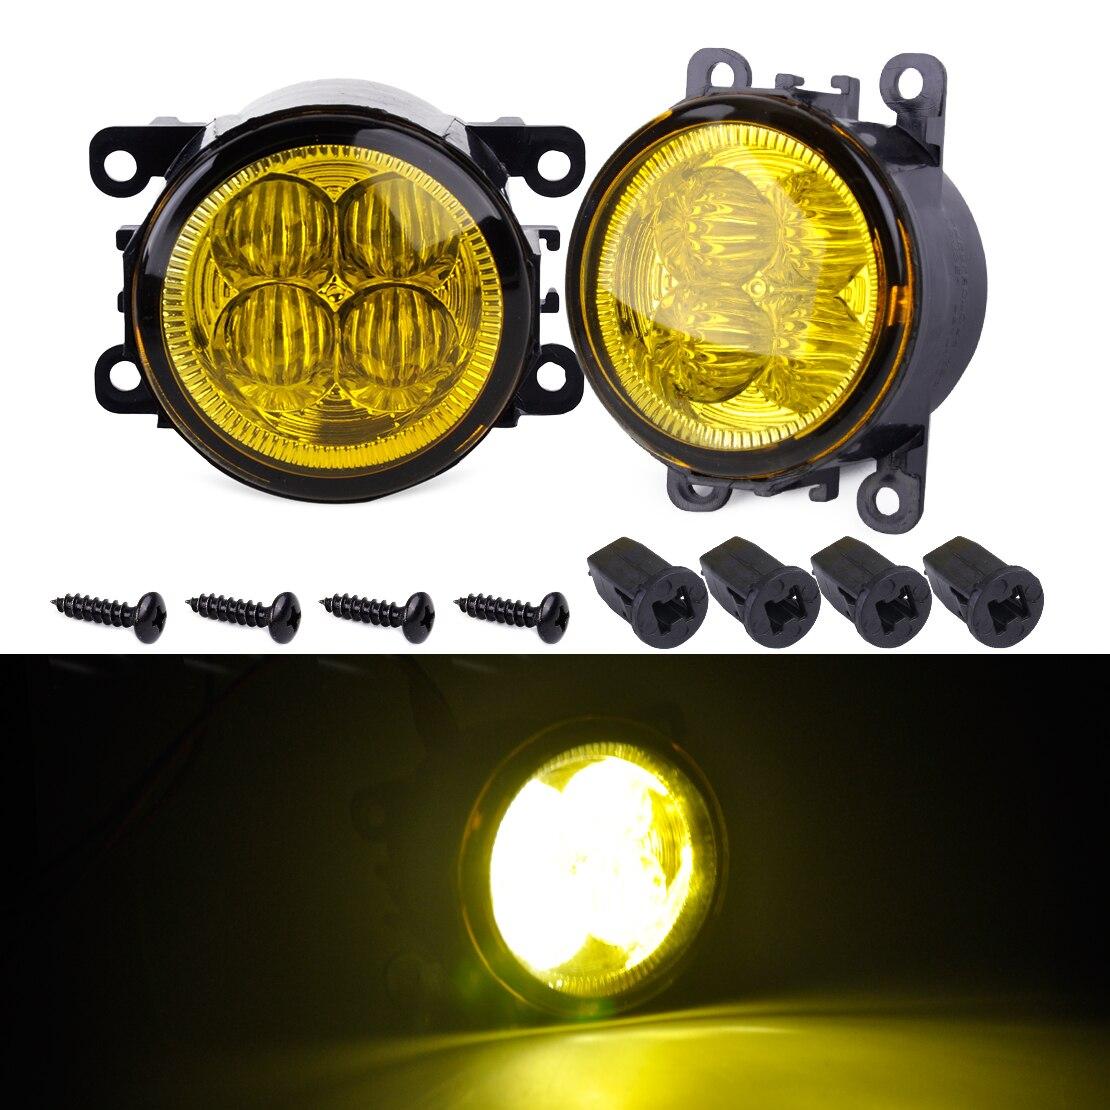 medium resolution of beler h11 fog light lamp wiring harness sockets wire switch kits for ford infiniti honda lincoln nissan